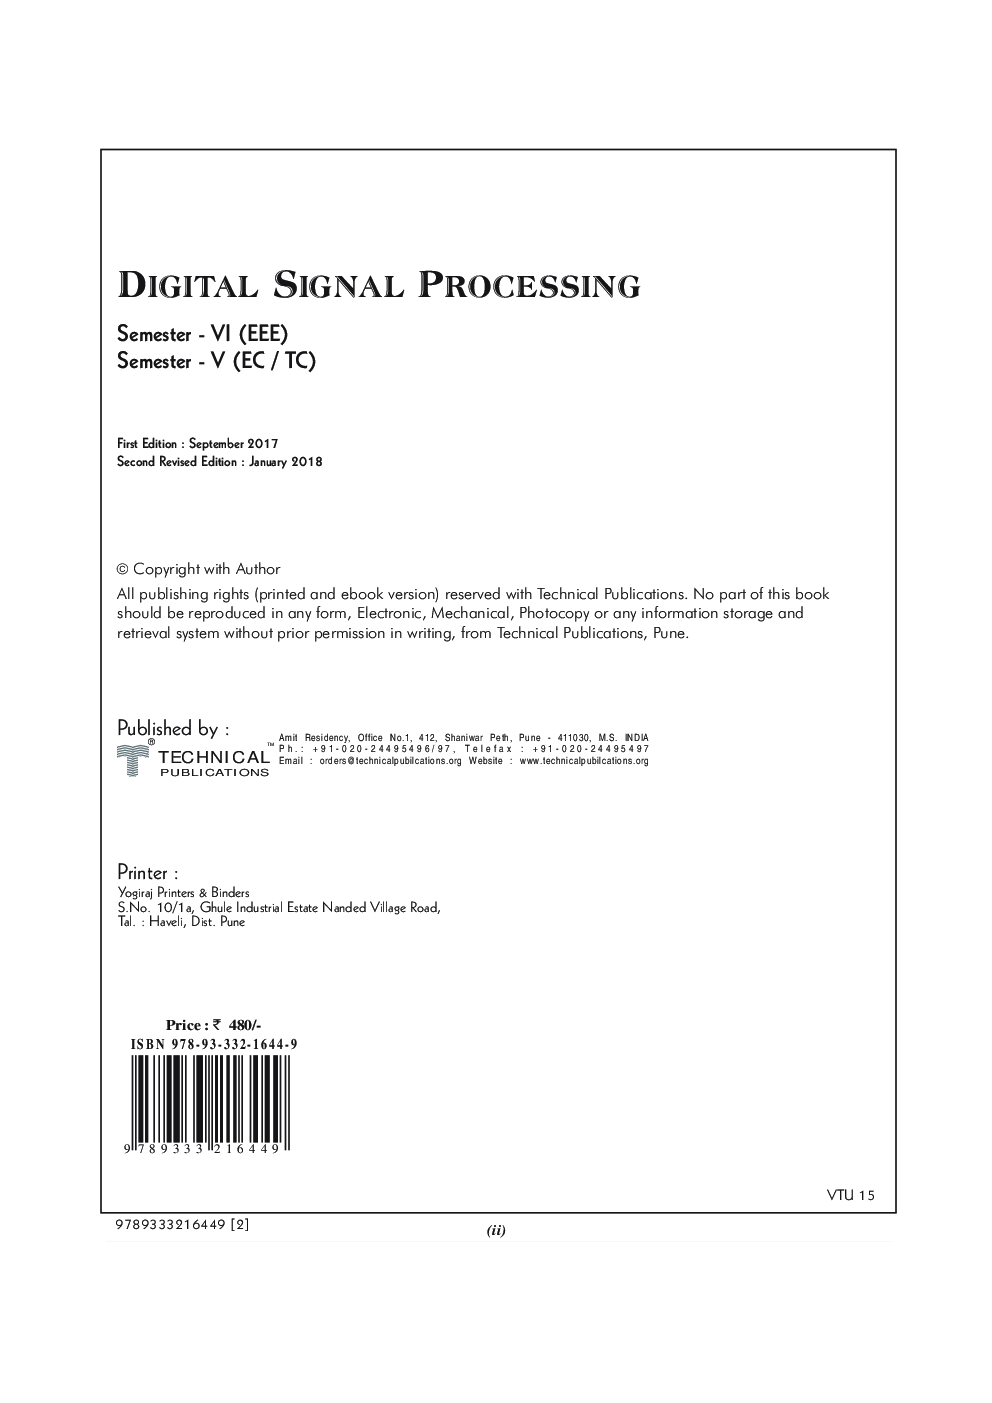 Digital Signal Processing For VTU - Page 3